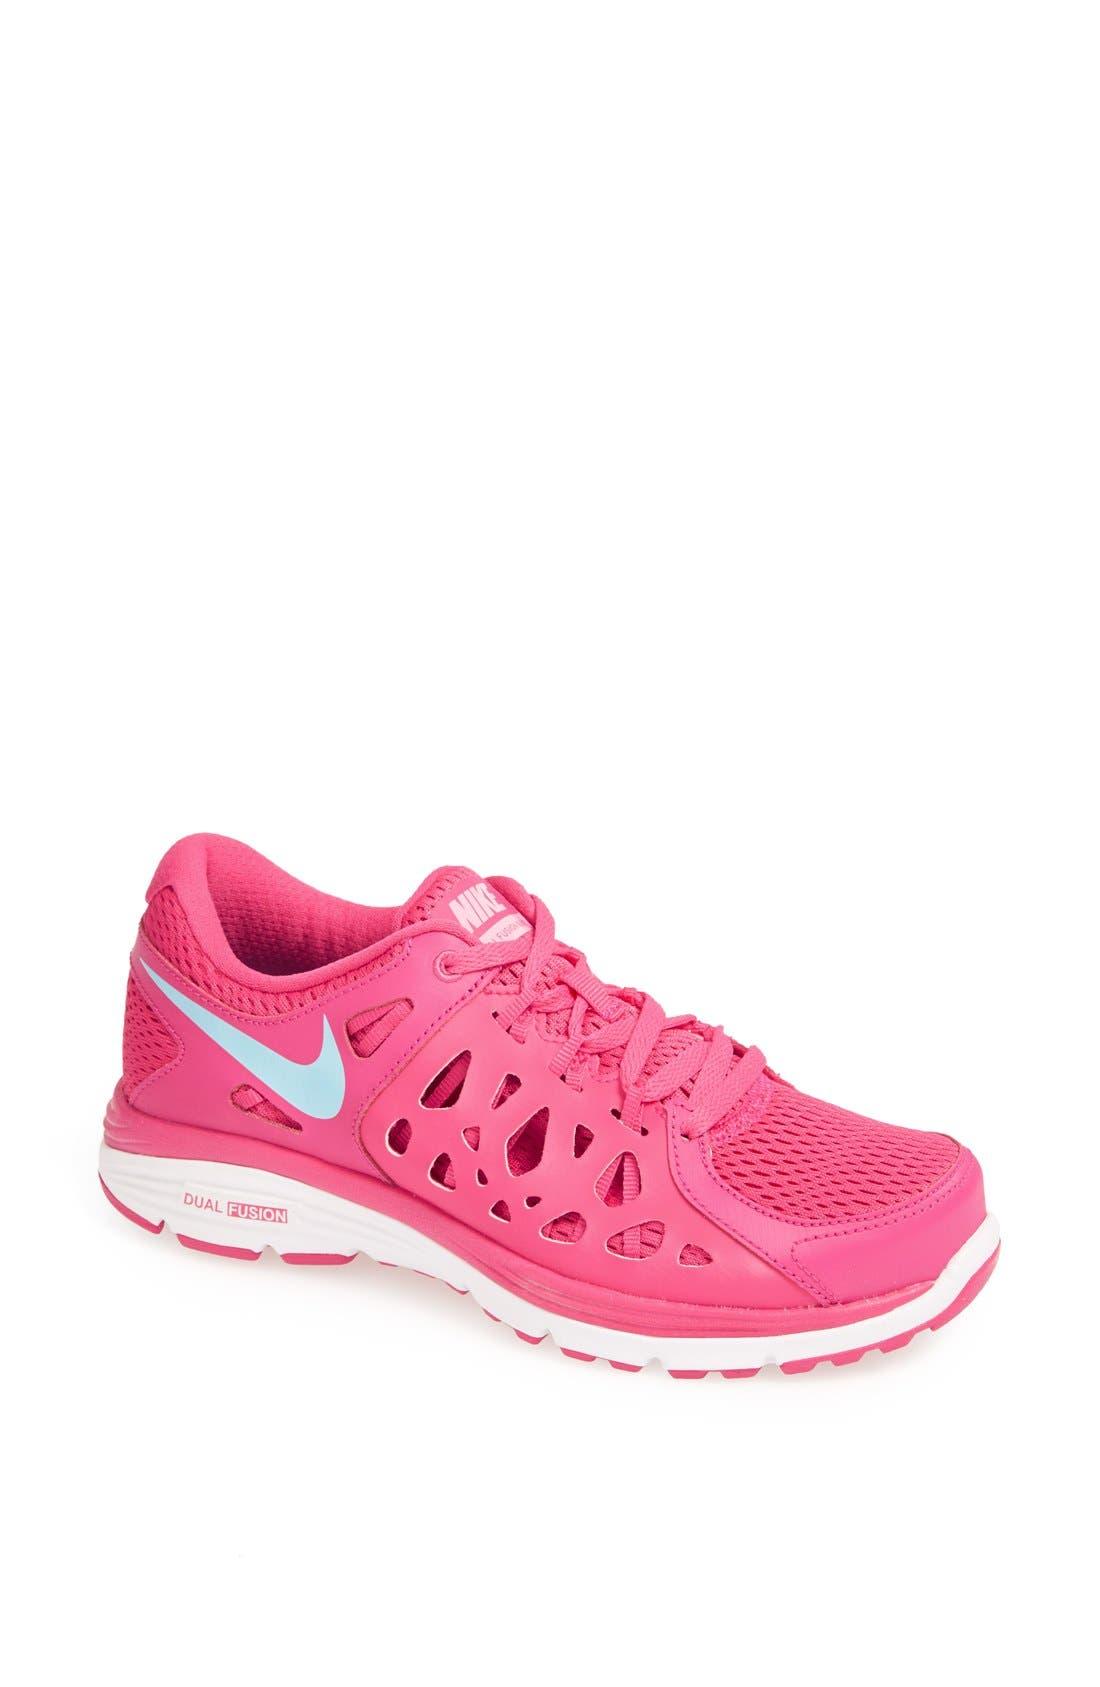 Alternate Image 1 Selected - Nike 'Dual Fusion 2.0' Running Shoe (Women)